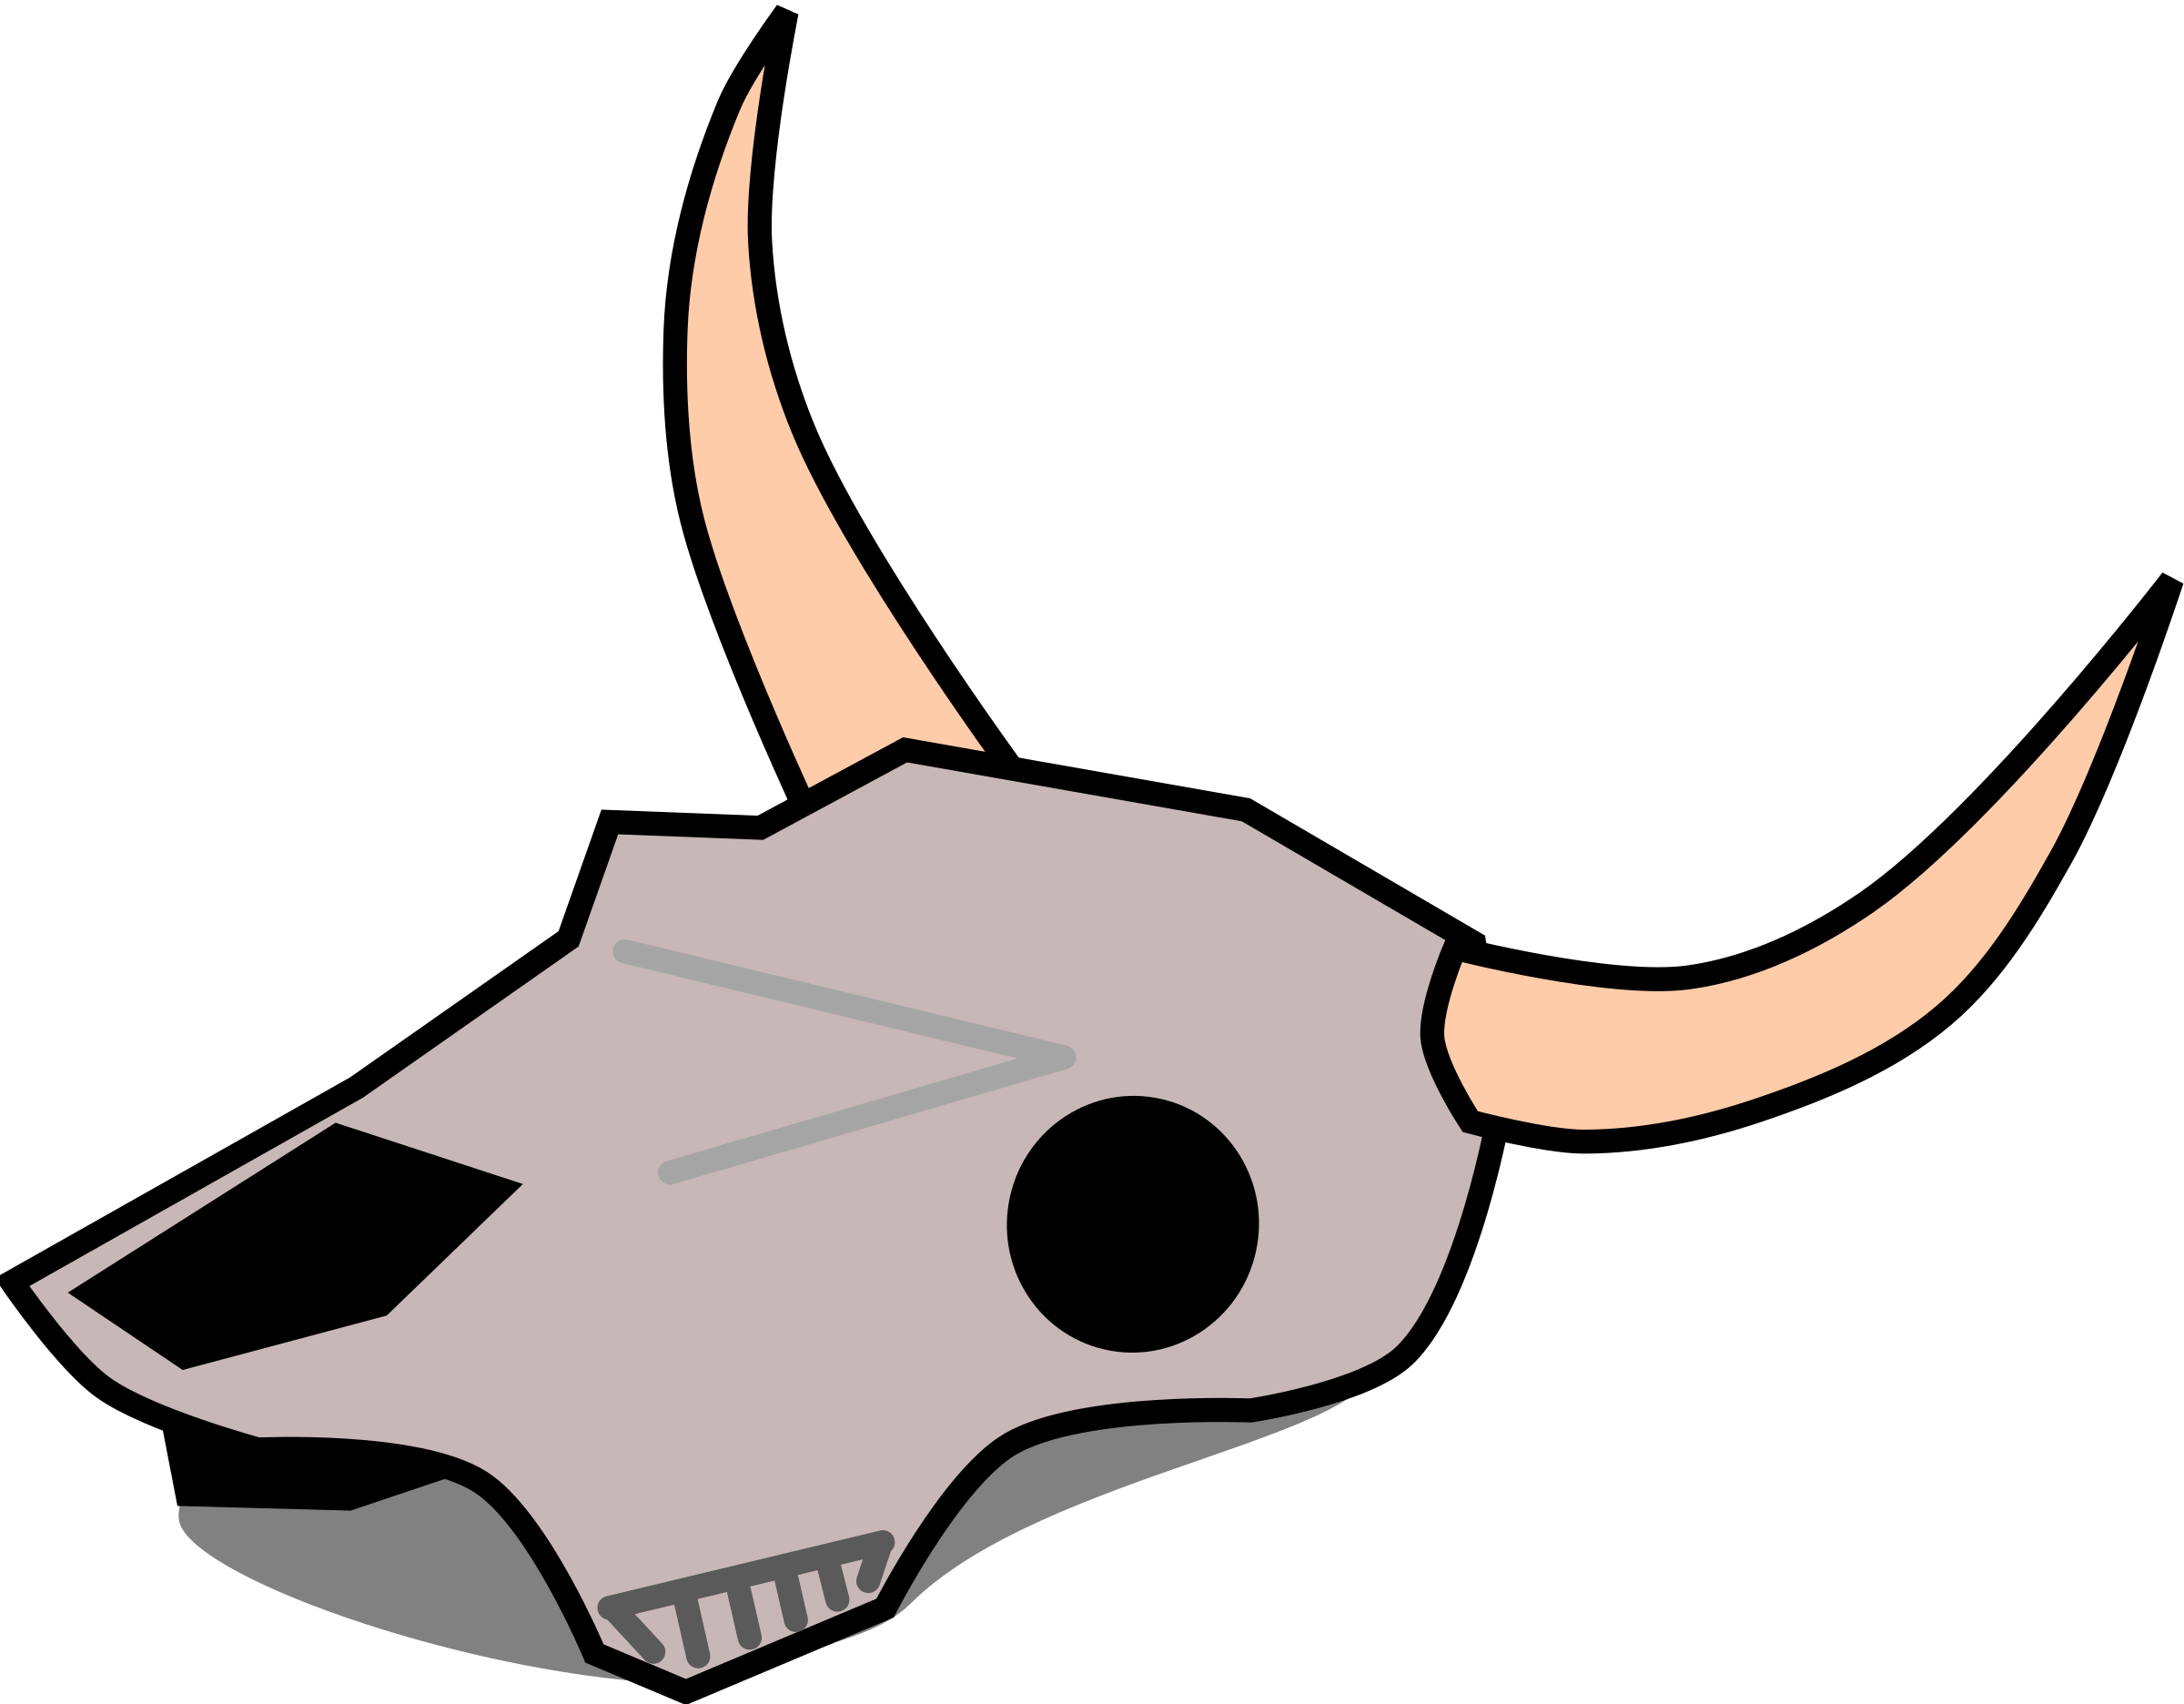 Cow skull clip art. Cowboy clipart skeleton